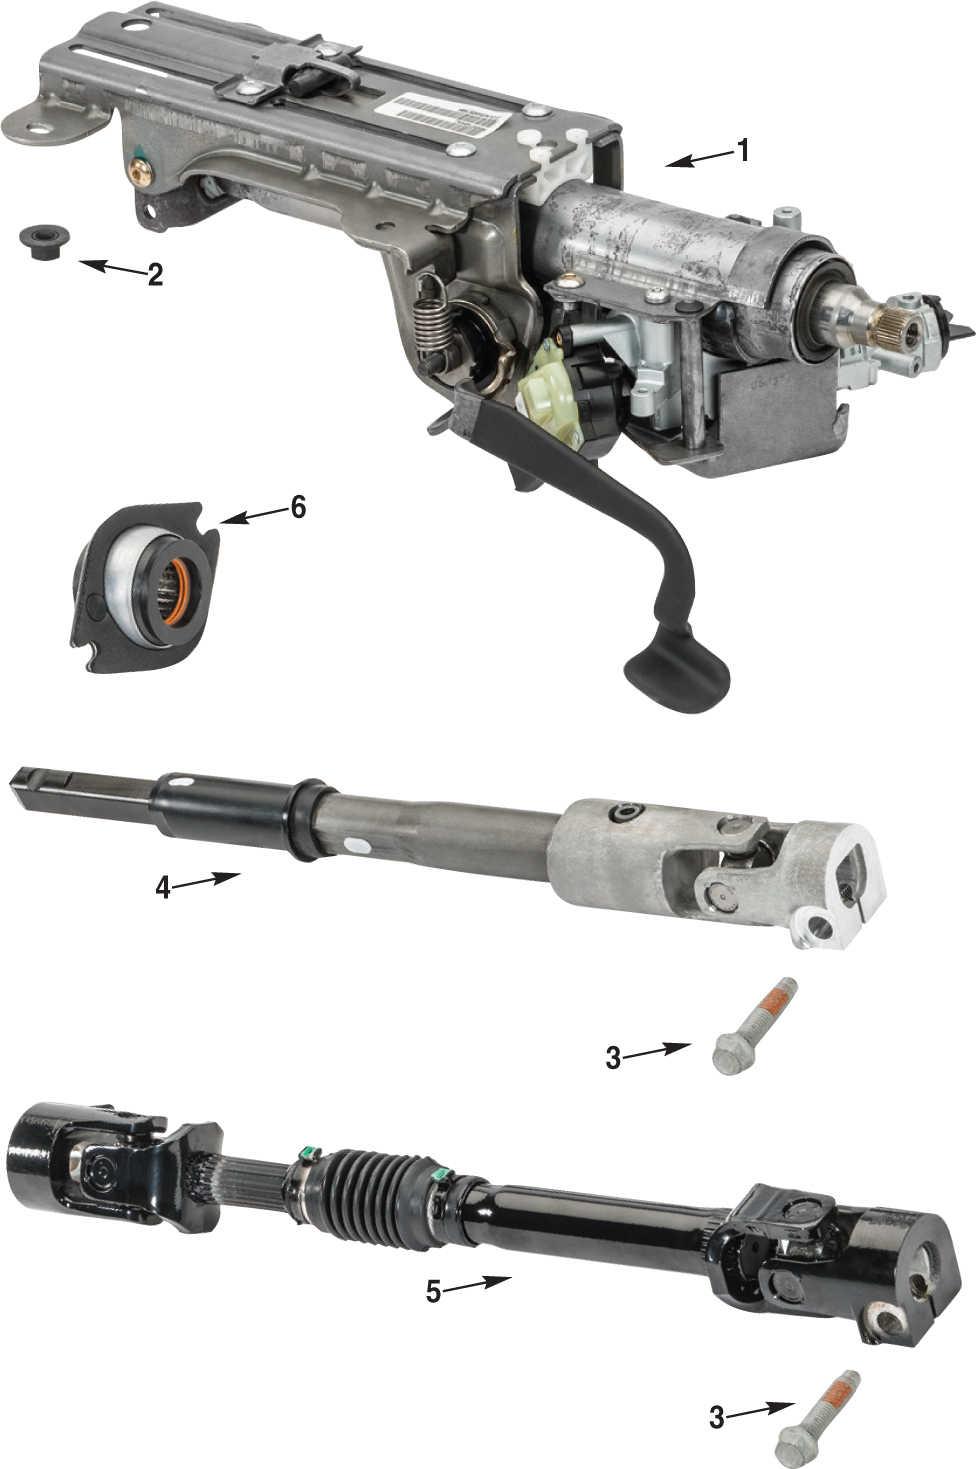 small resolution of jk wrangler steering column wiring diagram jk free 1990 jeep cherokee steering column wiring diagram 1990